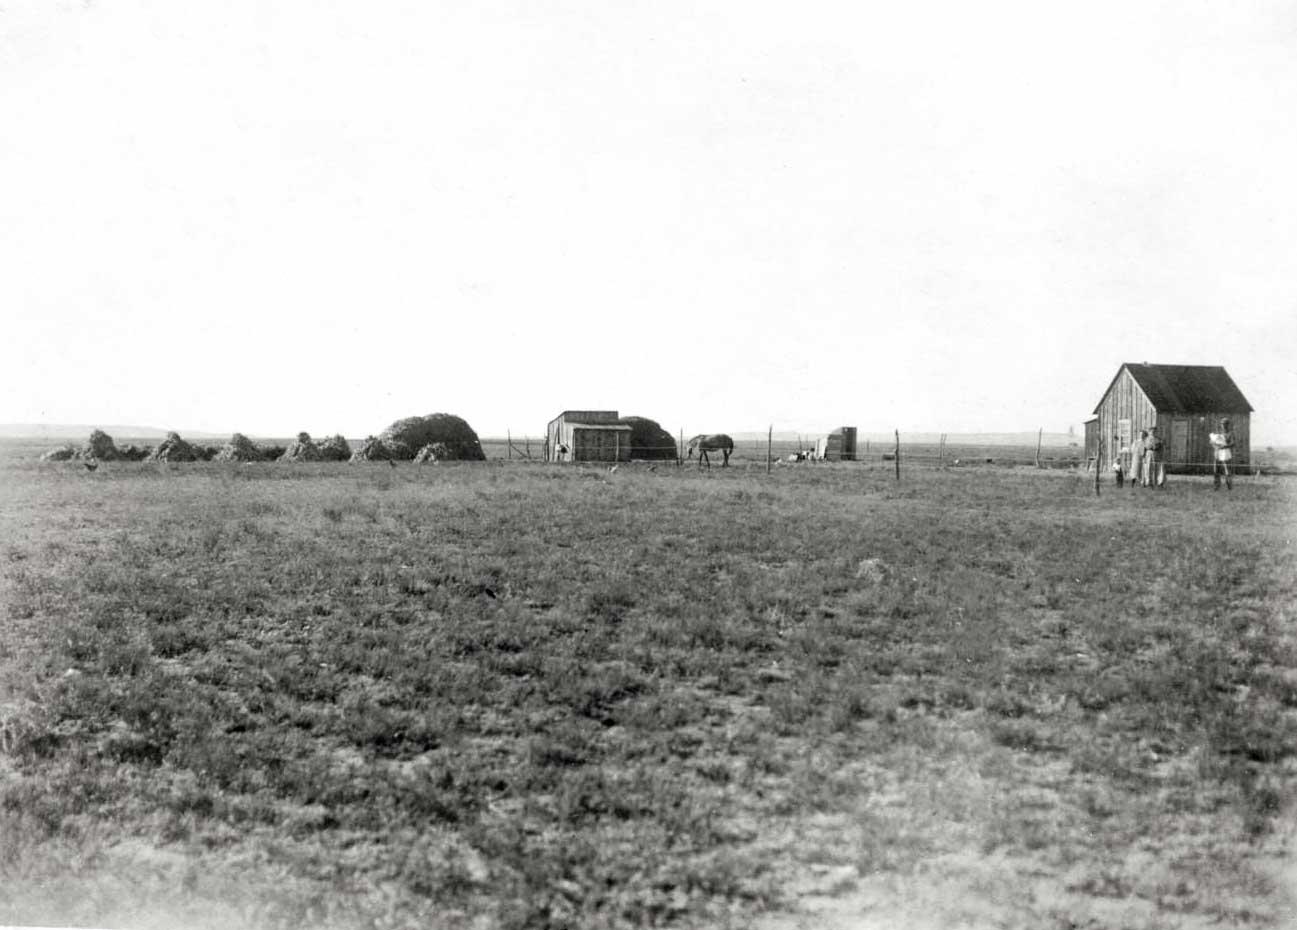 Farming The Encyclopedia Of Oklahoma History And Culture